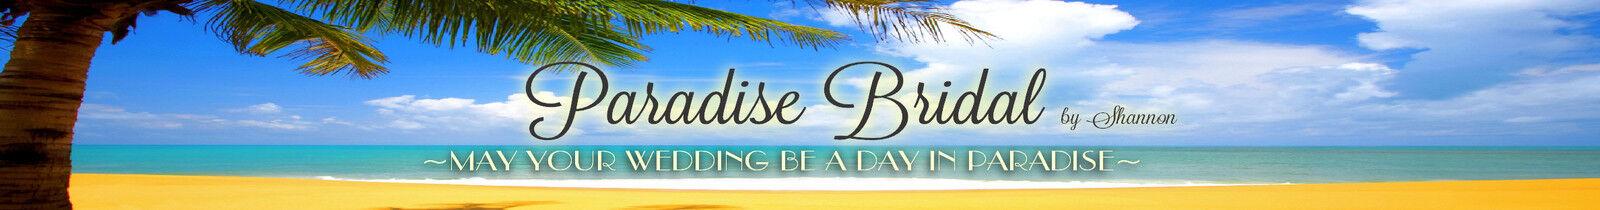 ParadiseBridal